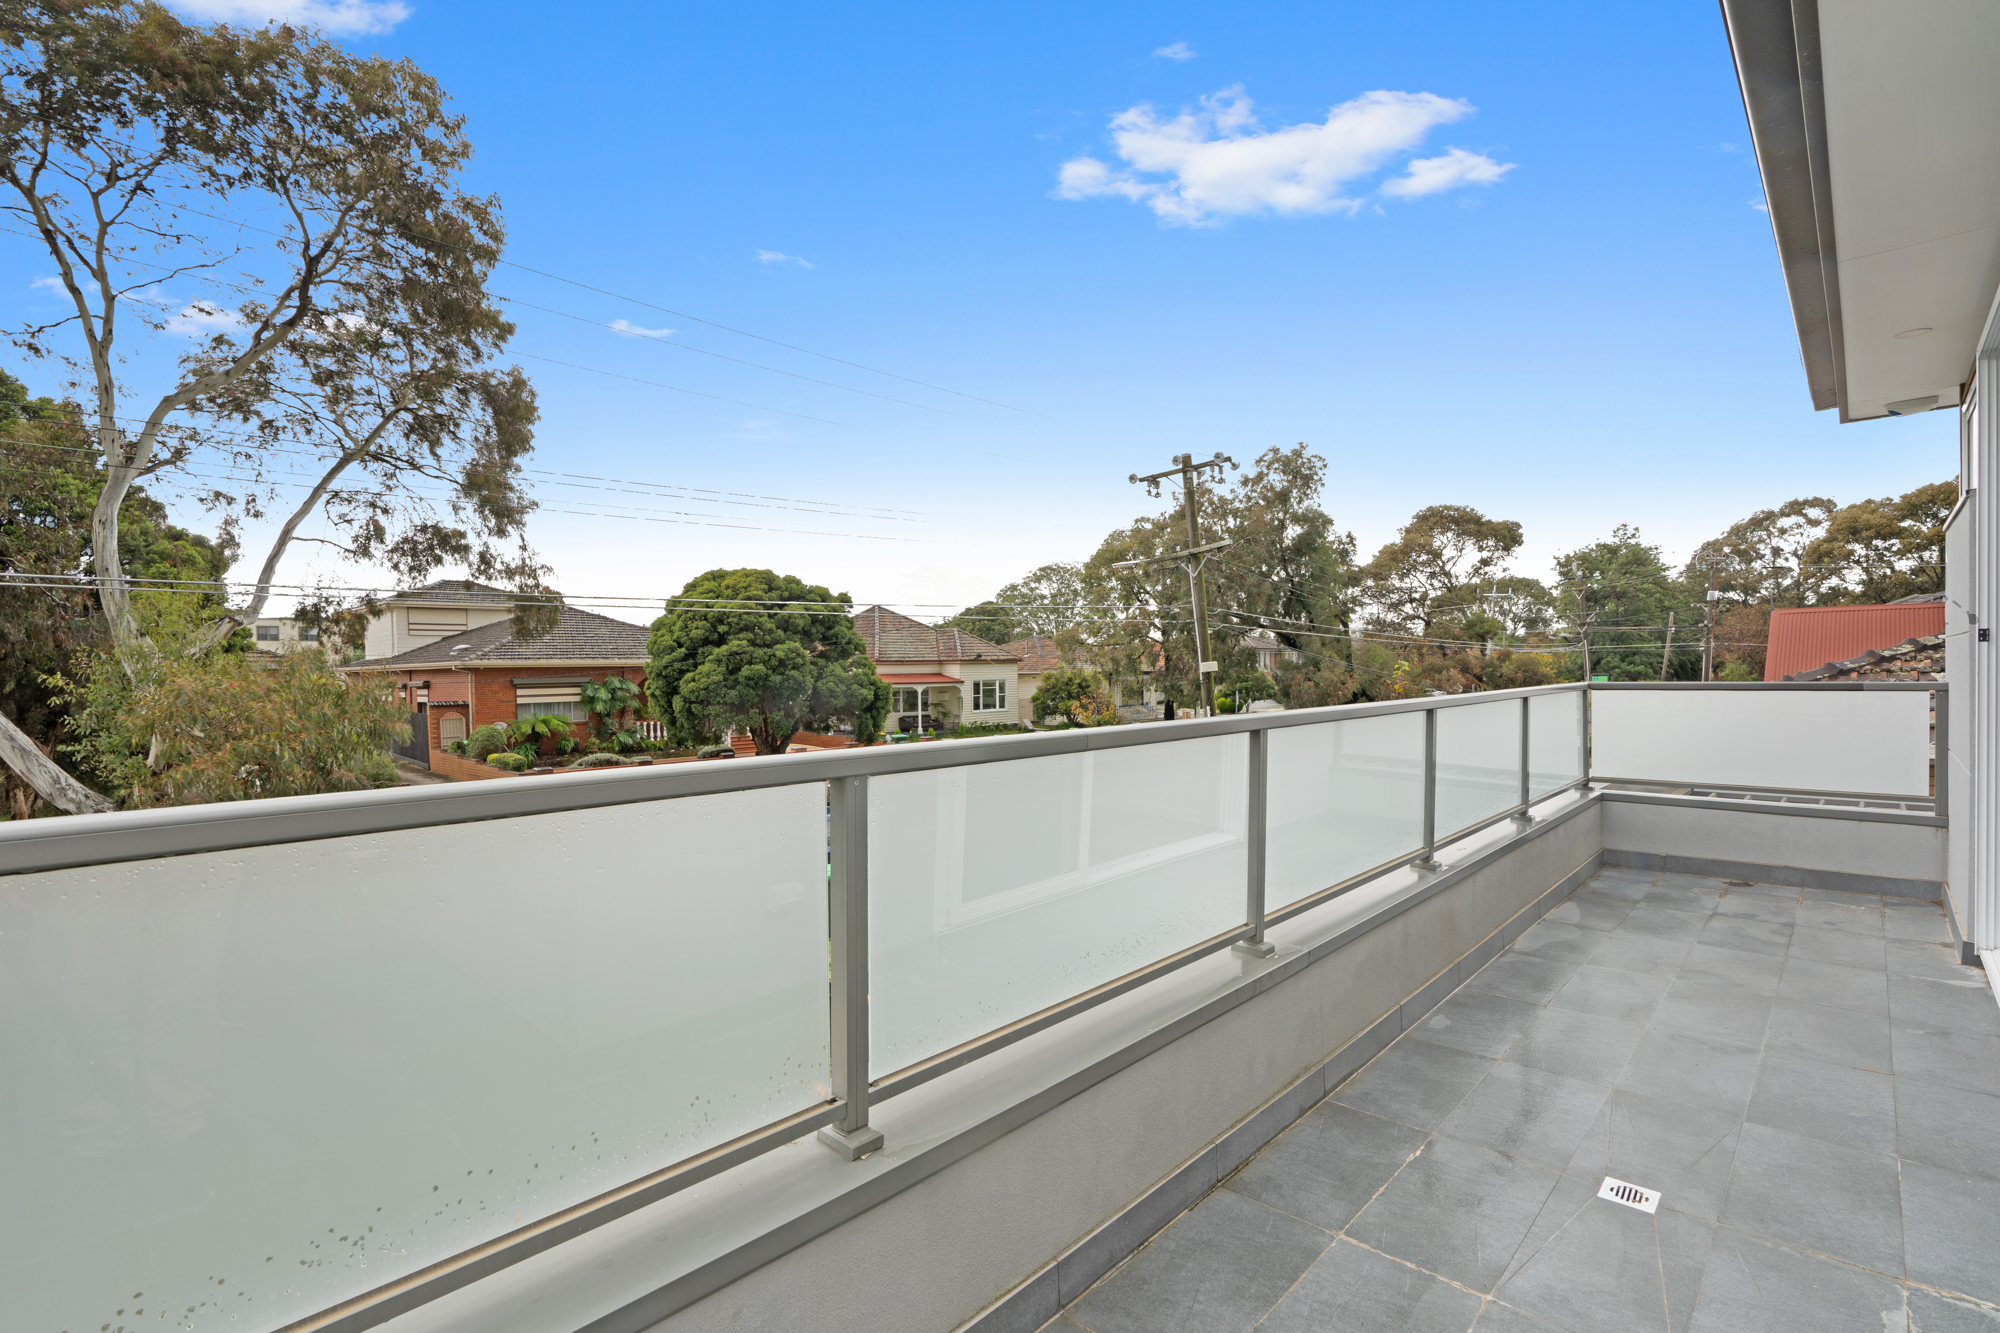 Melbourne Property Manager